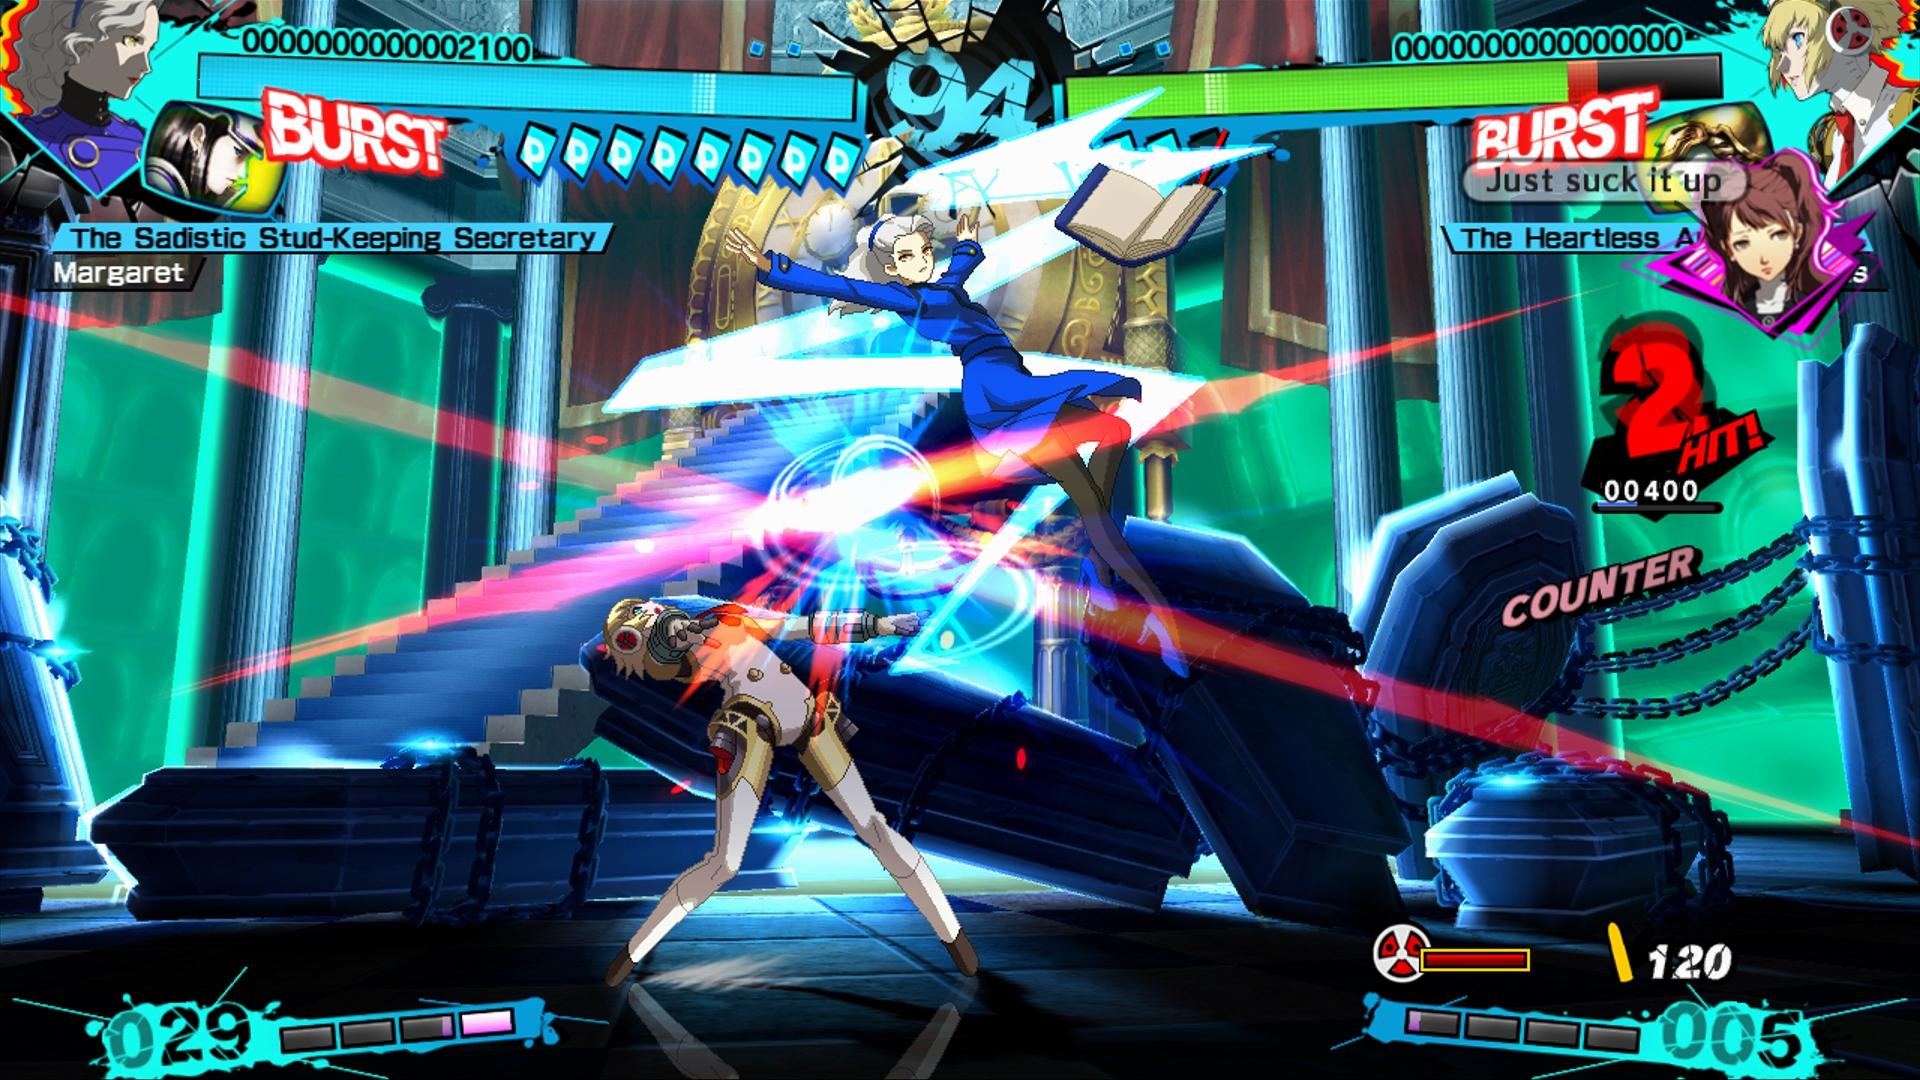 Persona 4 Arena Ultimax reveals DLC character Margaret